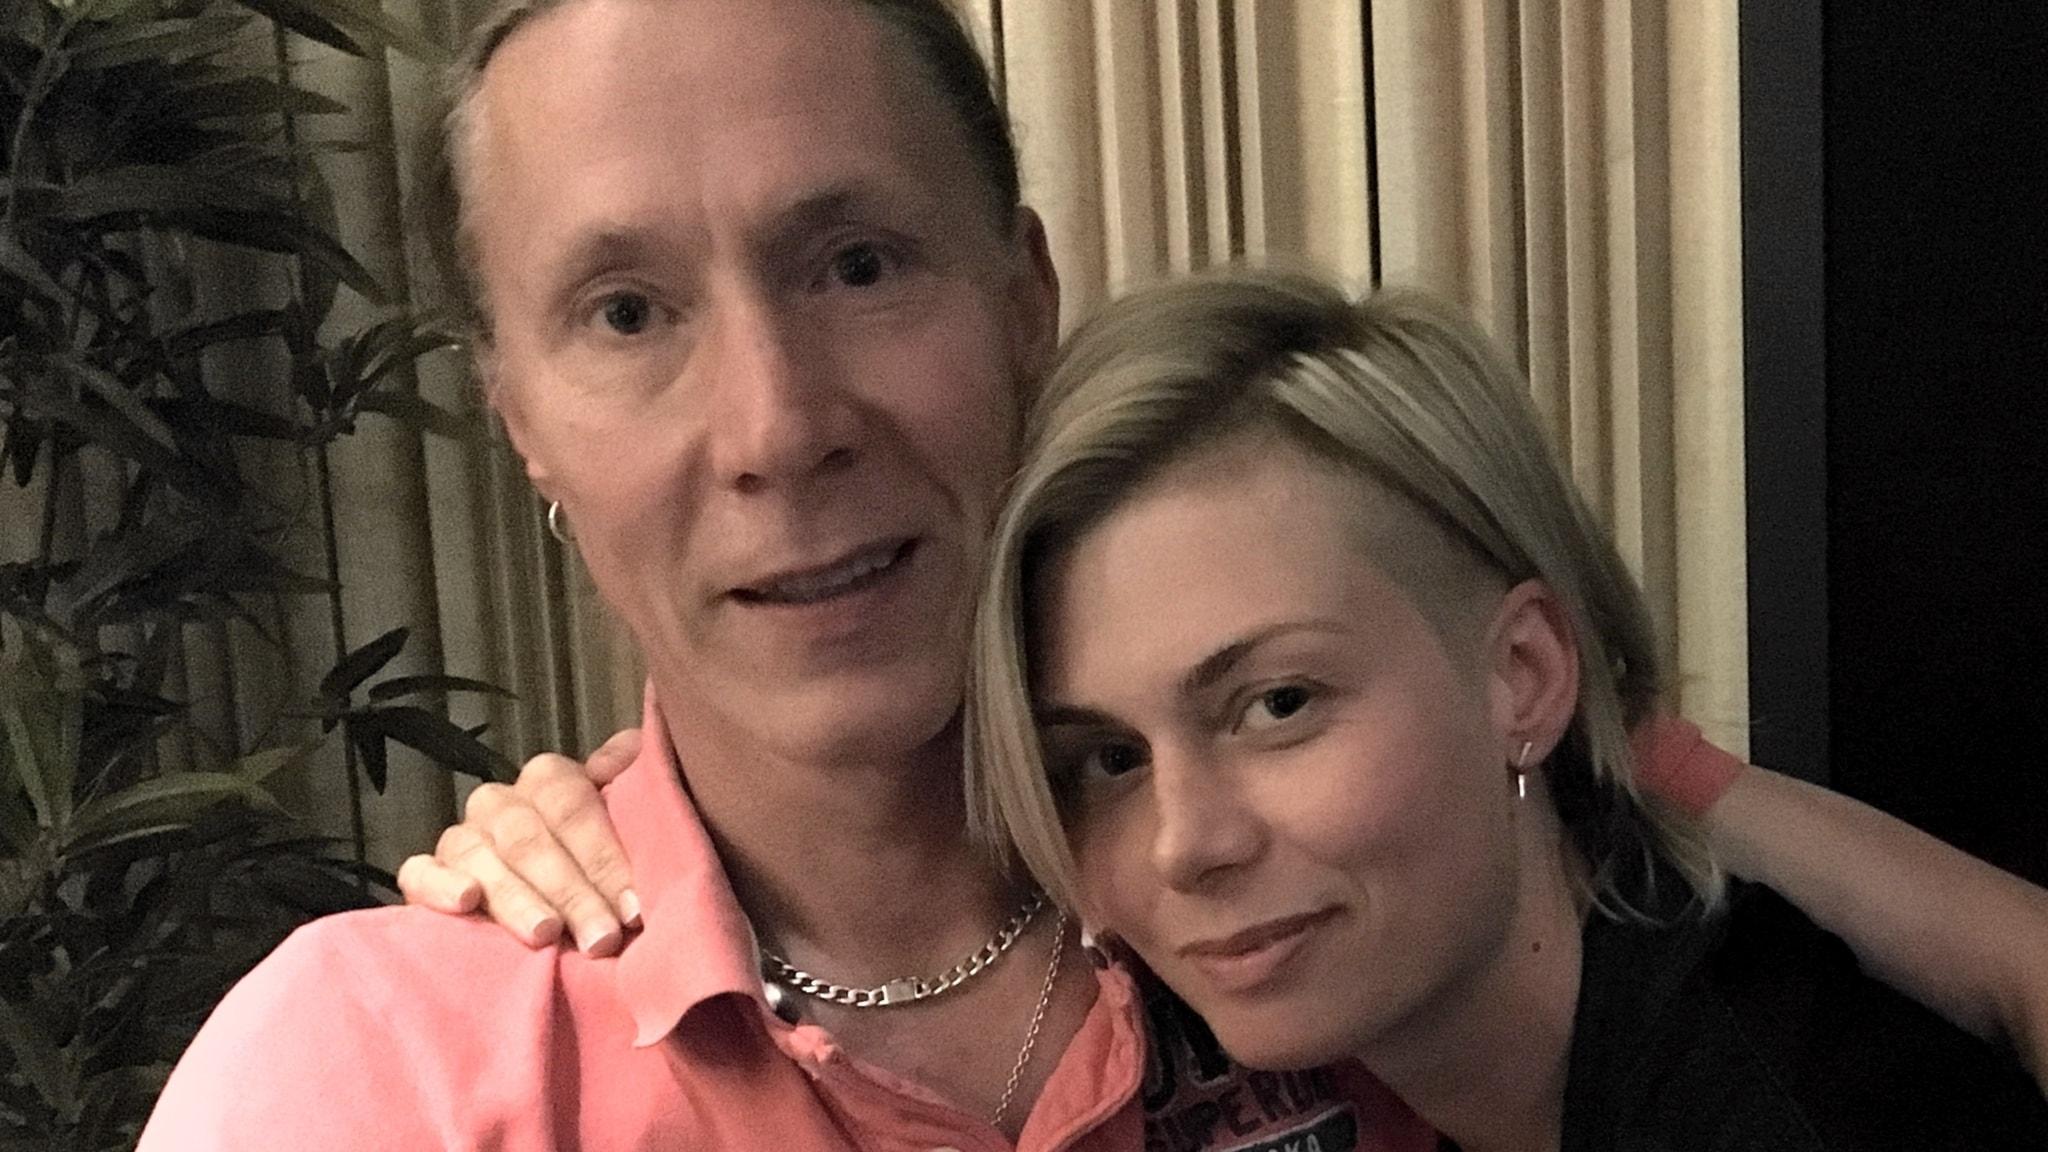 Musikspecial i P4: Anna Ternheim möter Martin E-Type Eriksson